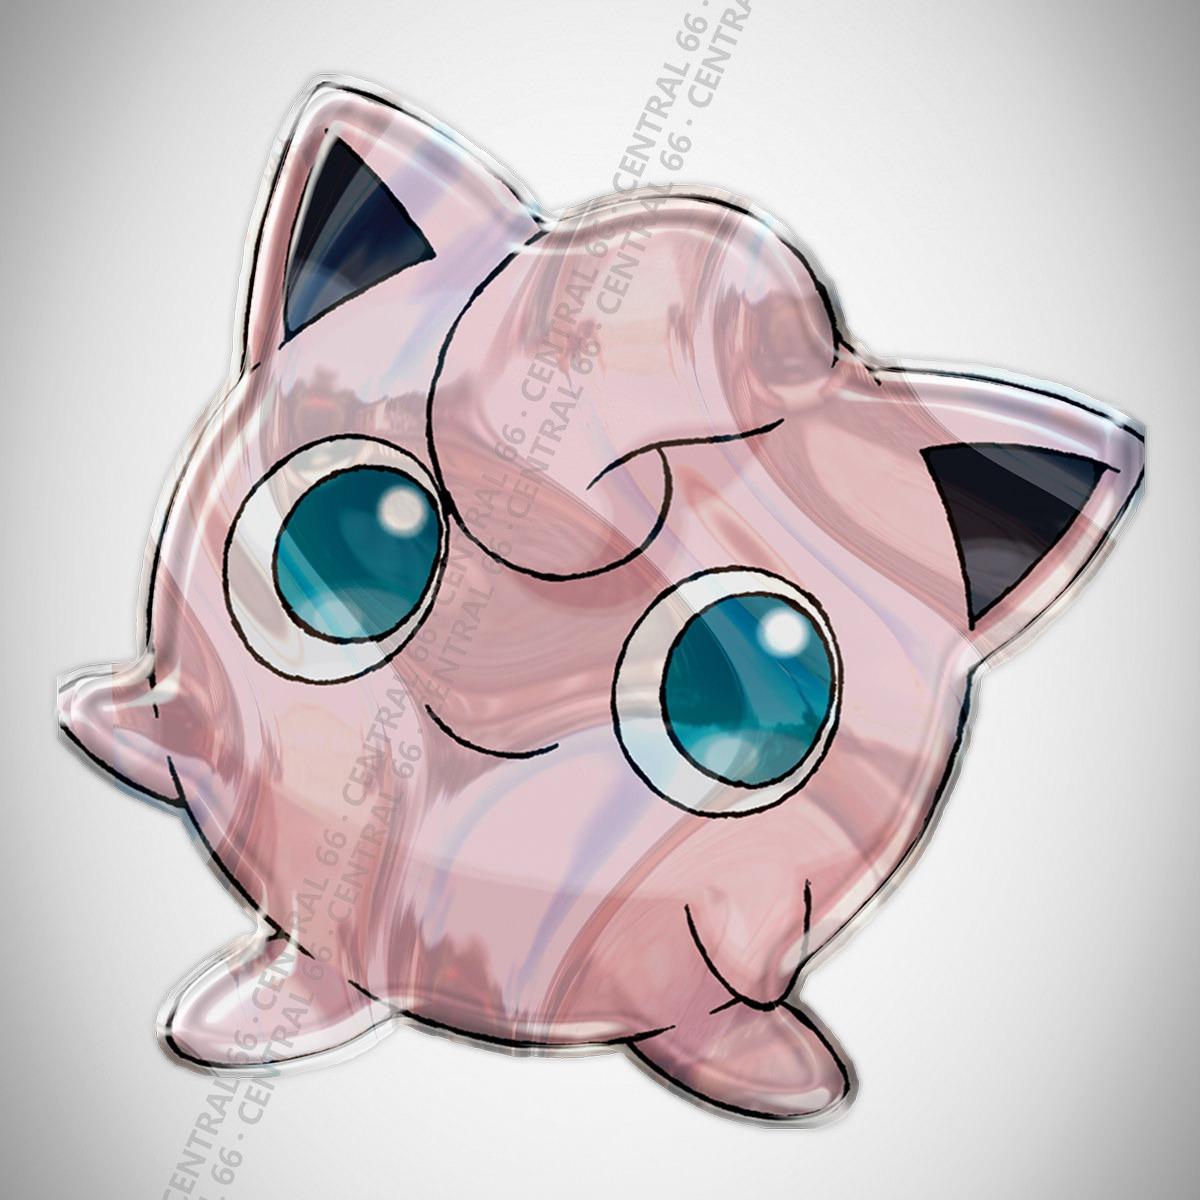 Adesivo Desenho Pokemon Jigglypuff Resinado R 29 90 Em Mercado